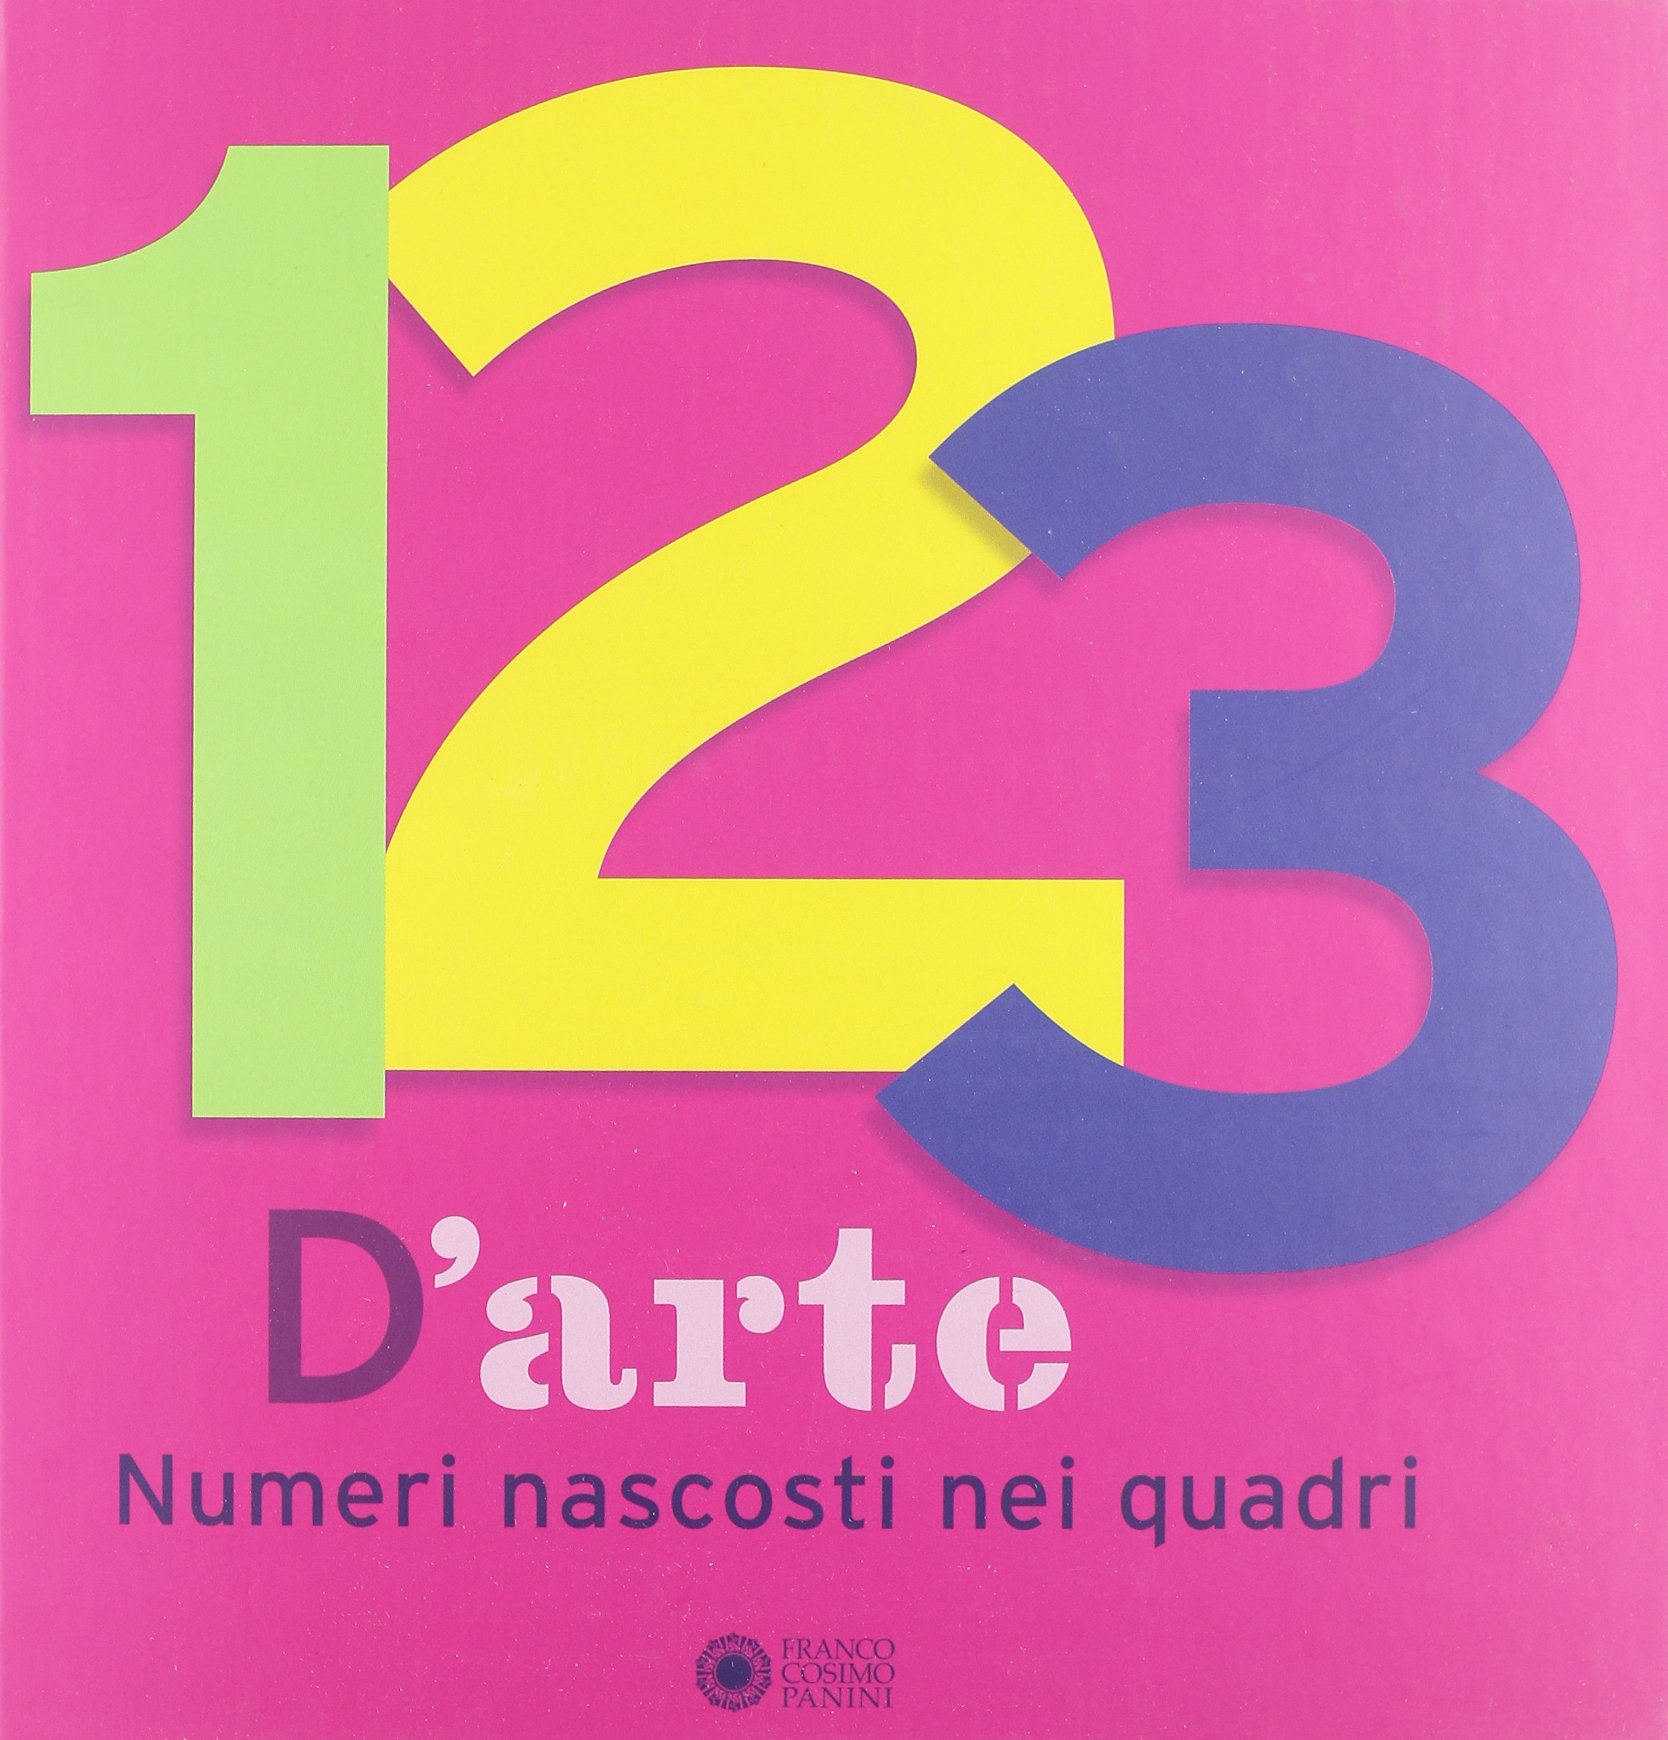 123 d'arte. Numeri nascosti nei quadri. Ediz. illustrata Copertina rigida – 29 ago 2012 Anne Guéry Olivier Dussutour F. Previati Franco Cosimo Panini